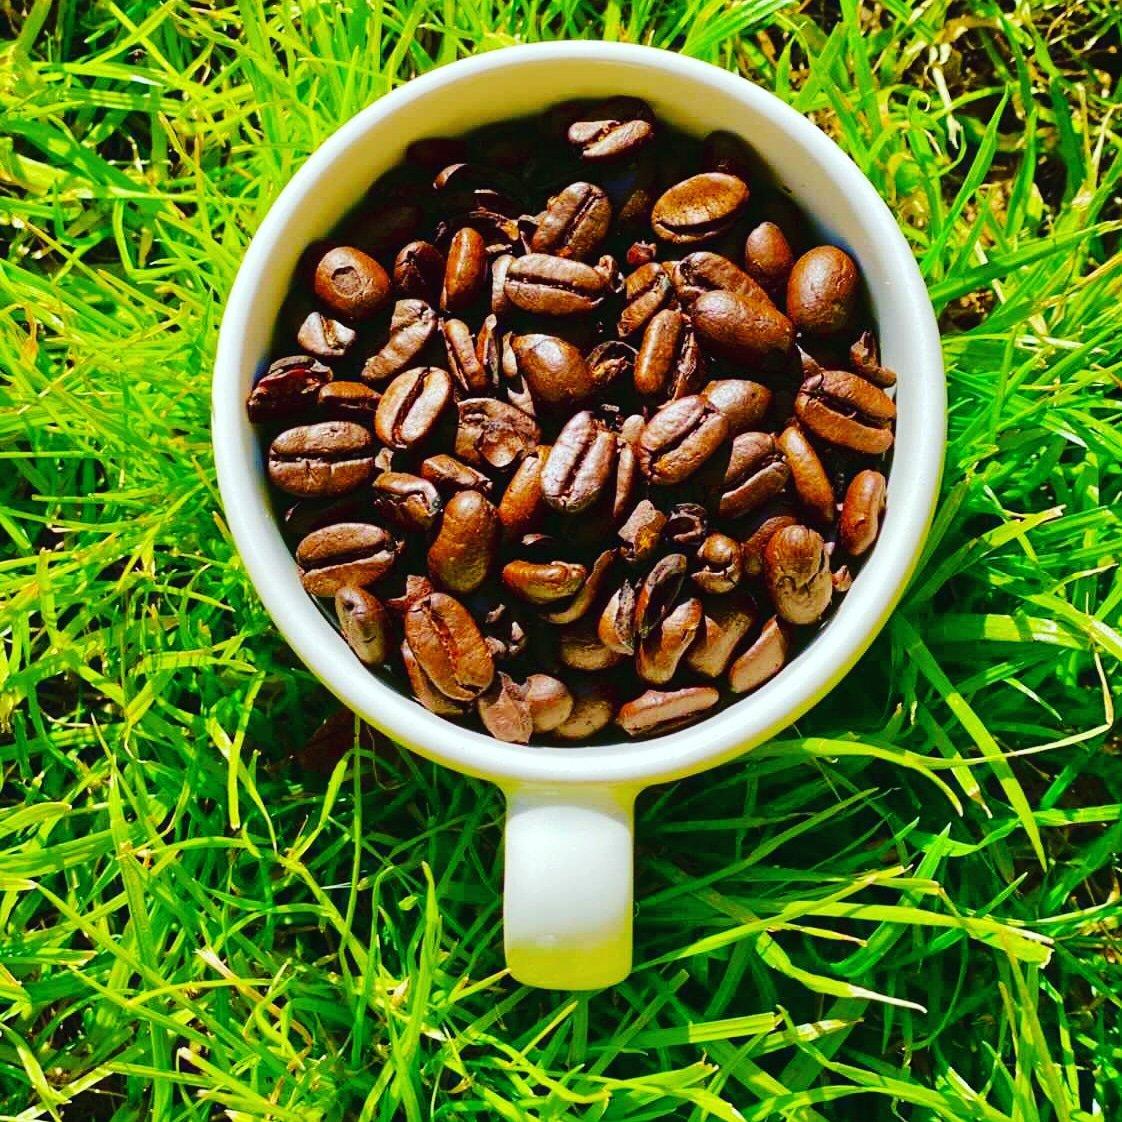 Happy Saturday, ya'll.   #coffeeaddict #coffeelife #cofferoaster #coffeedaily #coffeevibes #espresso #flavor #coffee #Coffeeroaster #veteranowned #blacktrianglecoffee